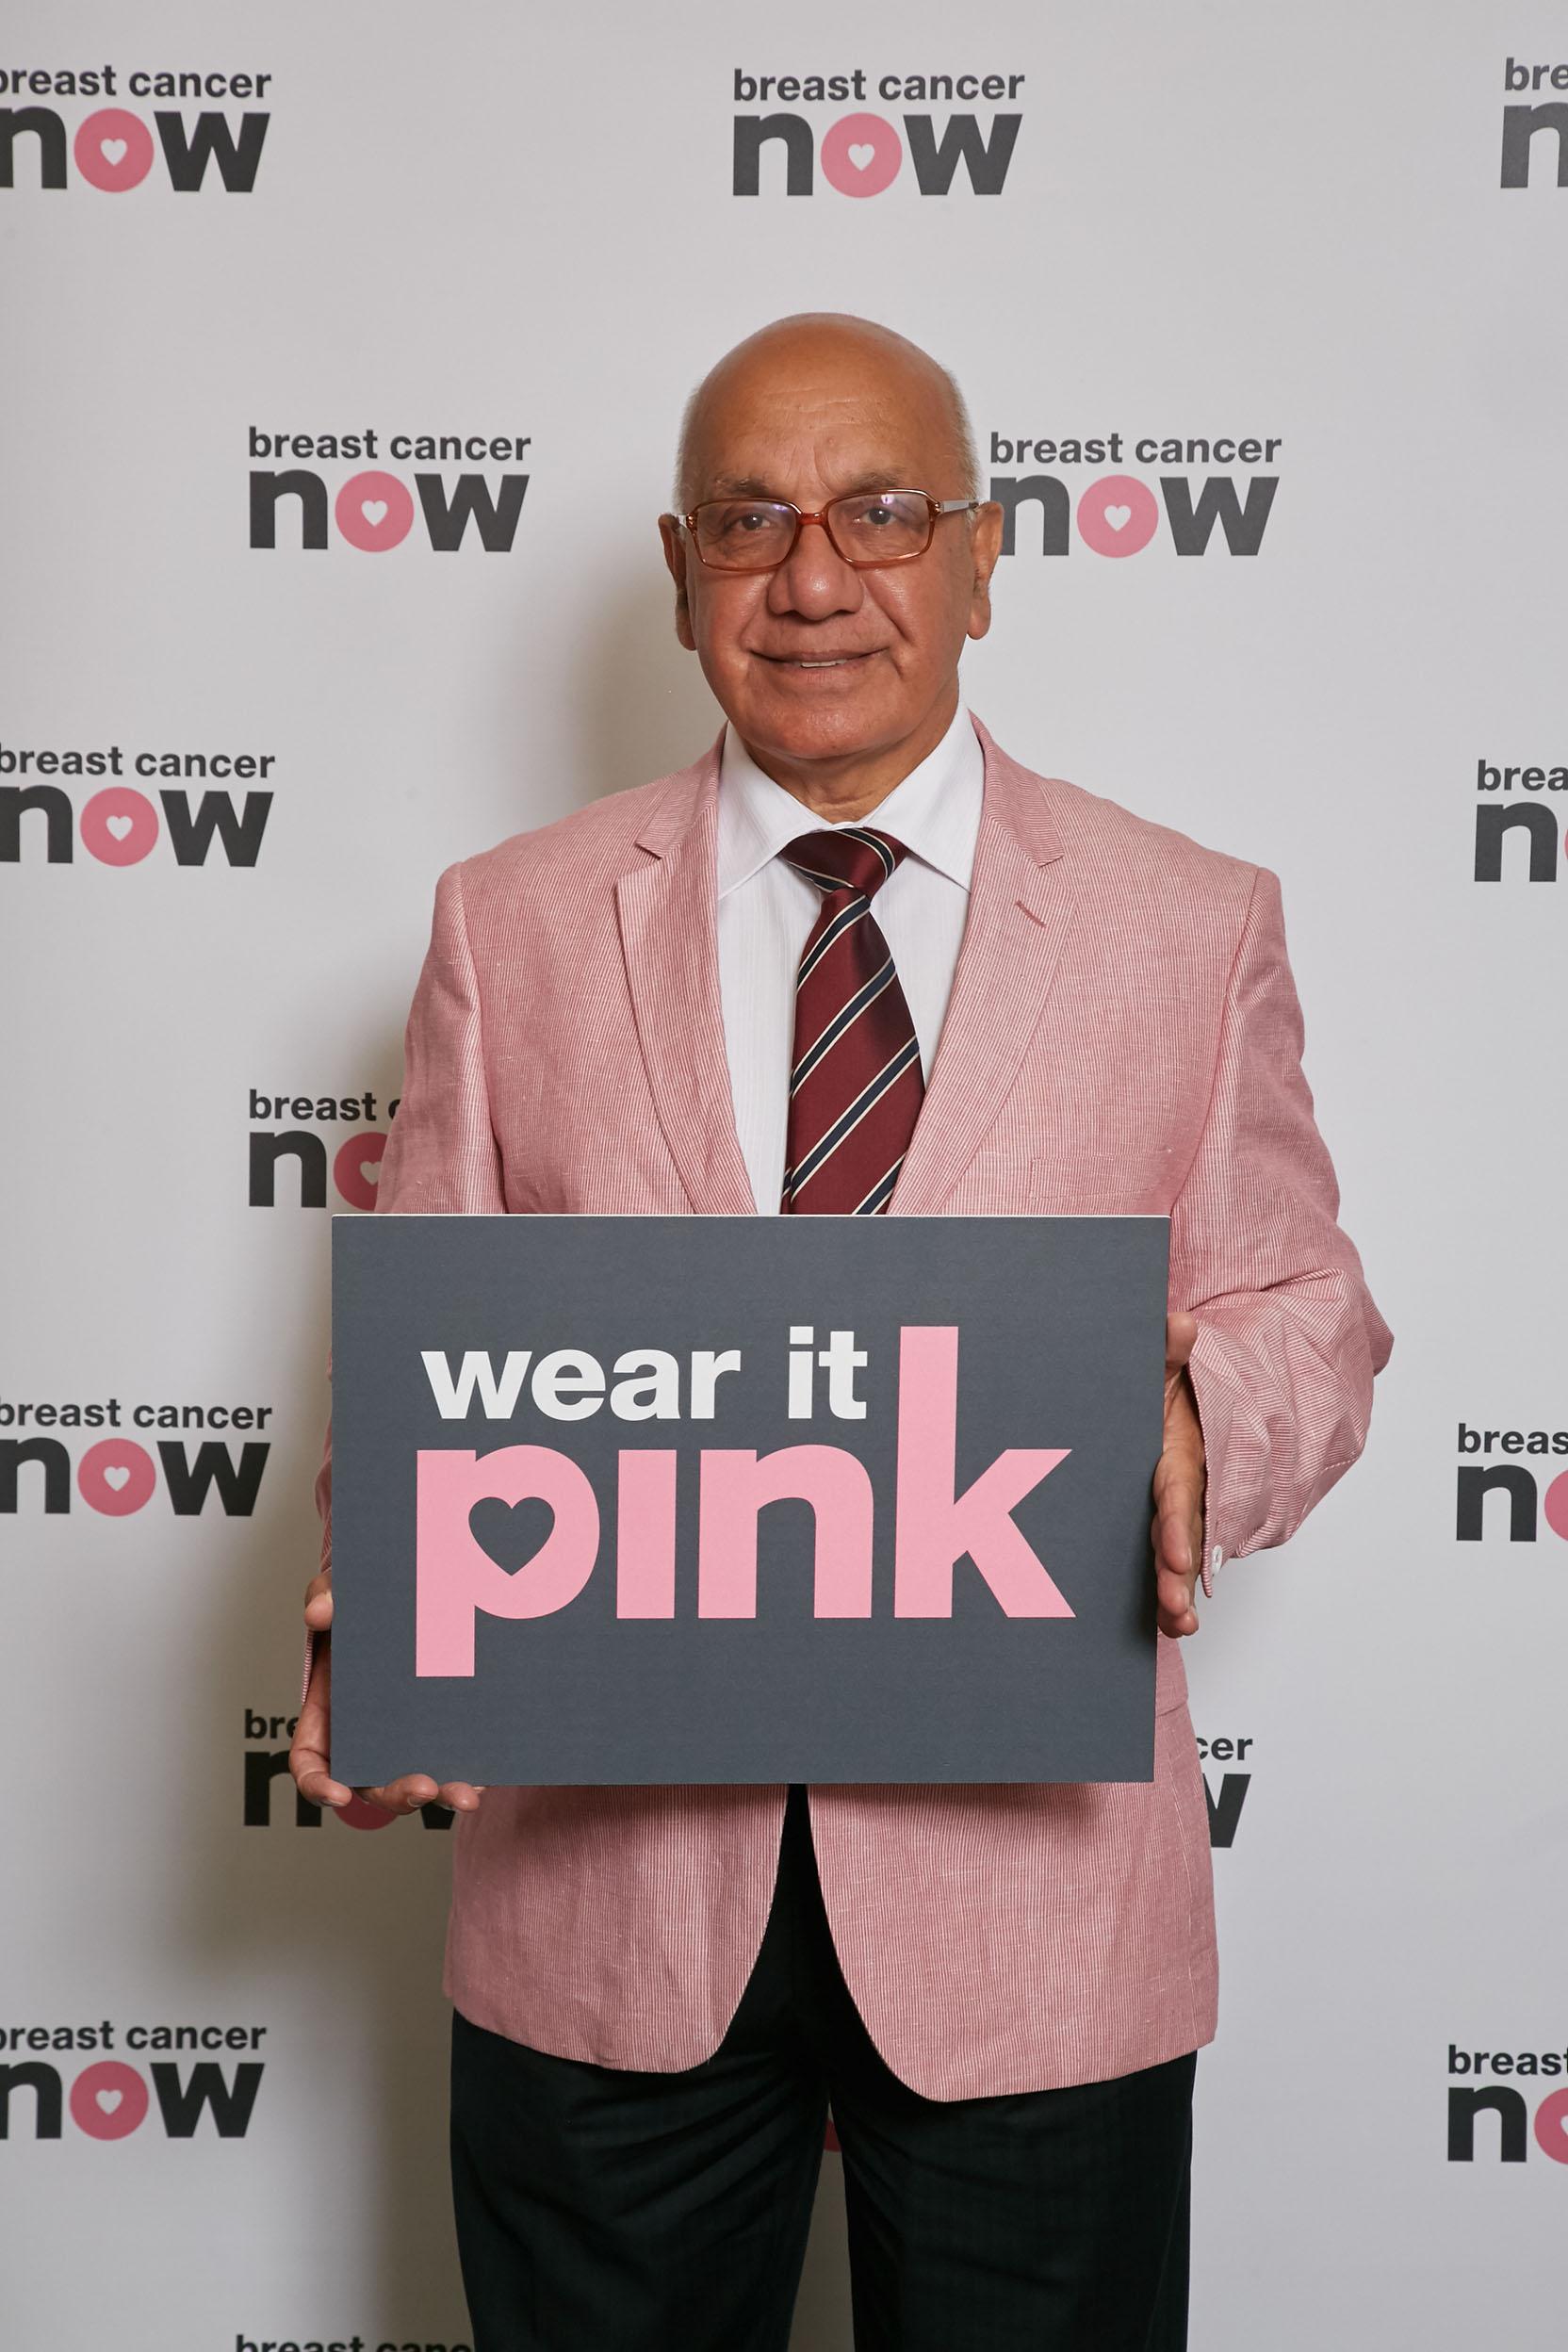 Virendra_Sharma_MP_Breast_Cancer_Now_.jpg